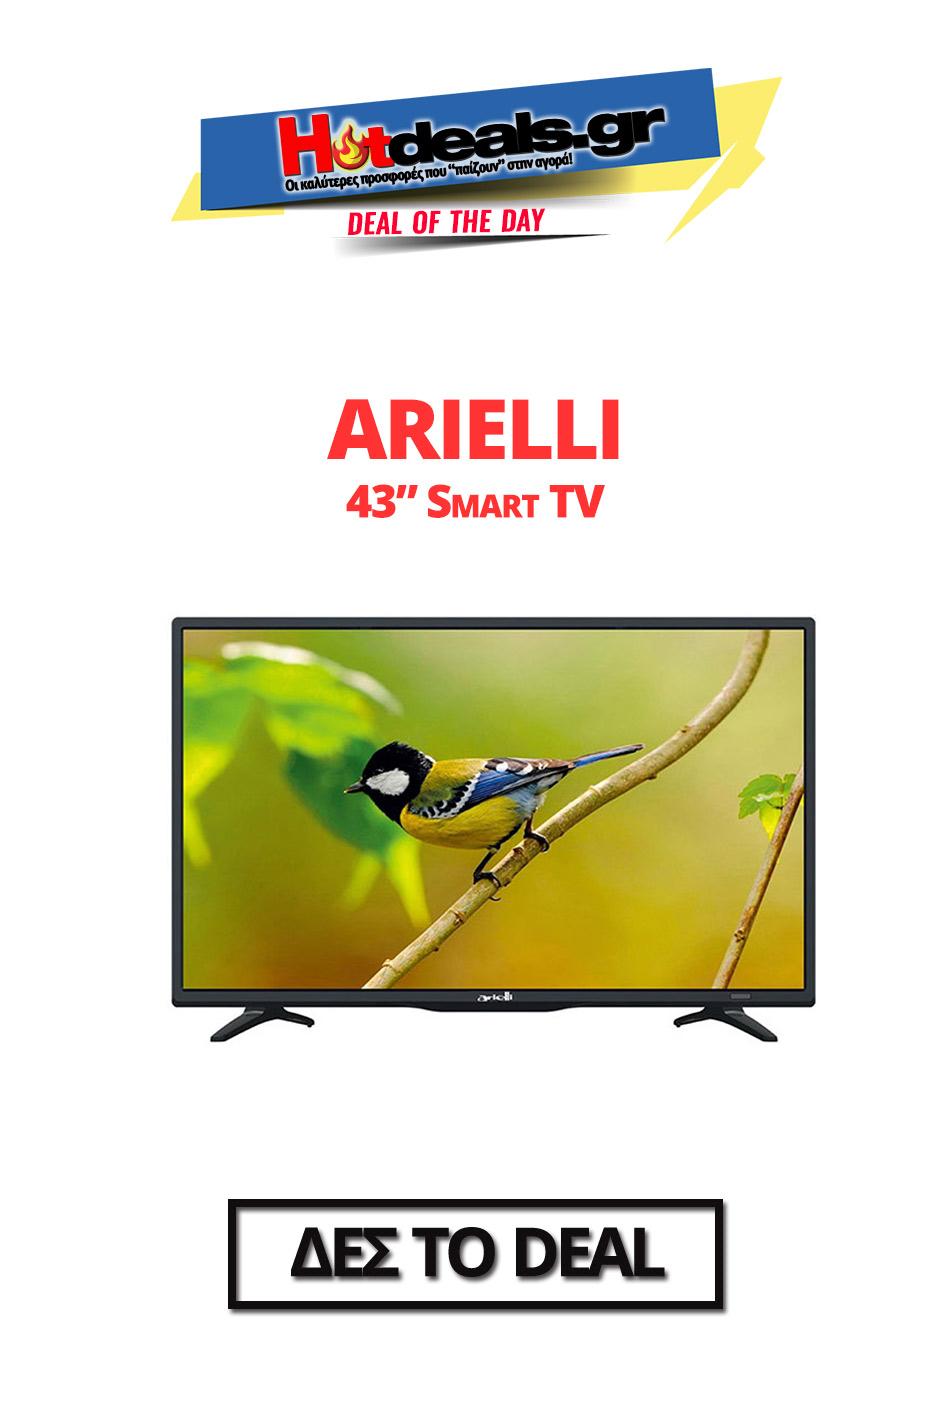 Arielli-43DN5ND-prosfora-thleorash-public-smart-tv-43-inch-full-hd-black-friday-publicgr-hotdealsgr